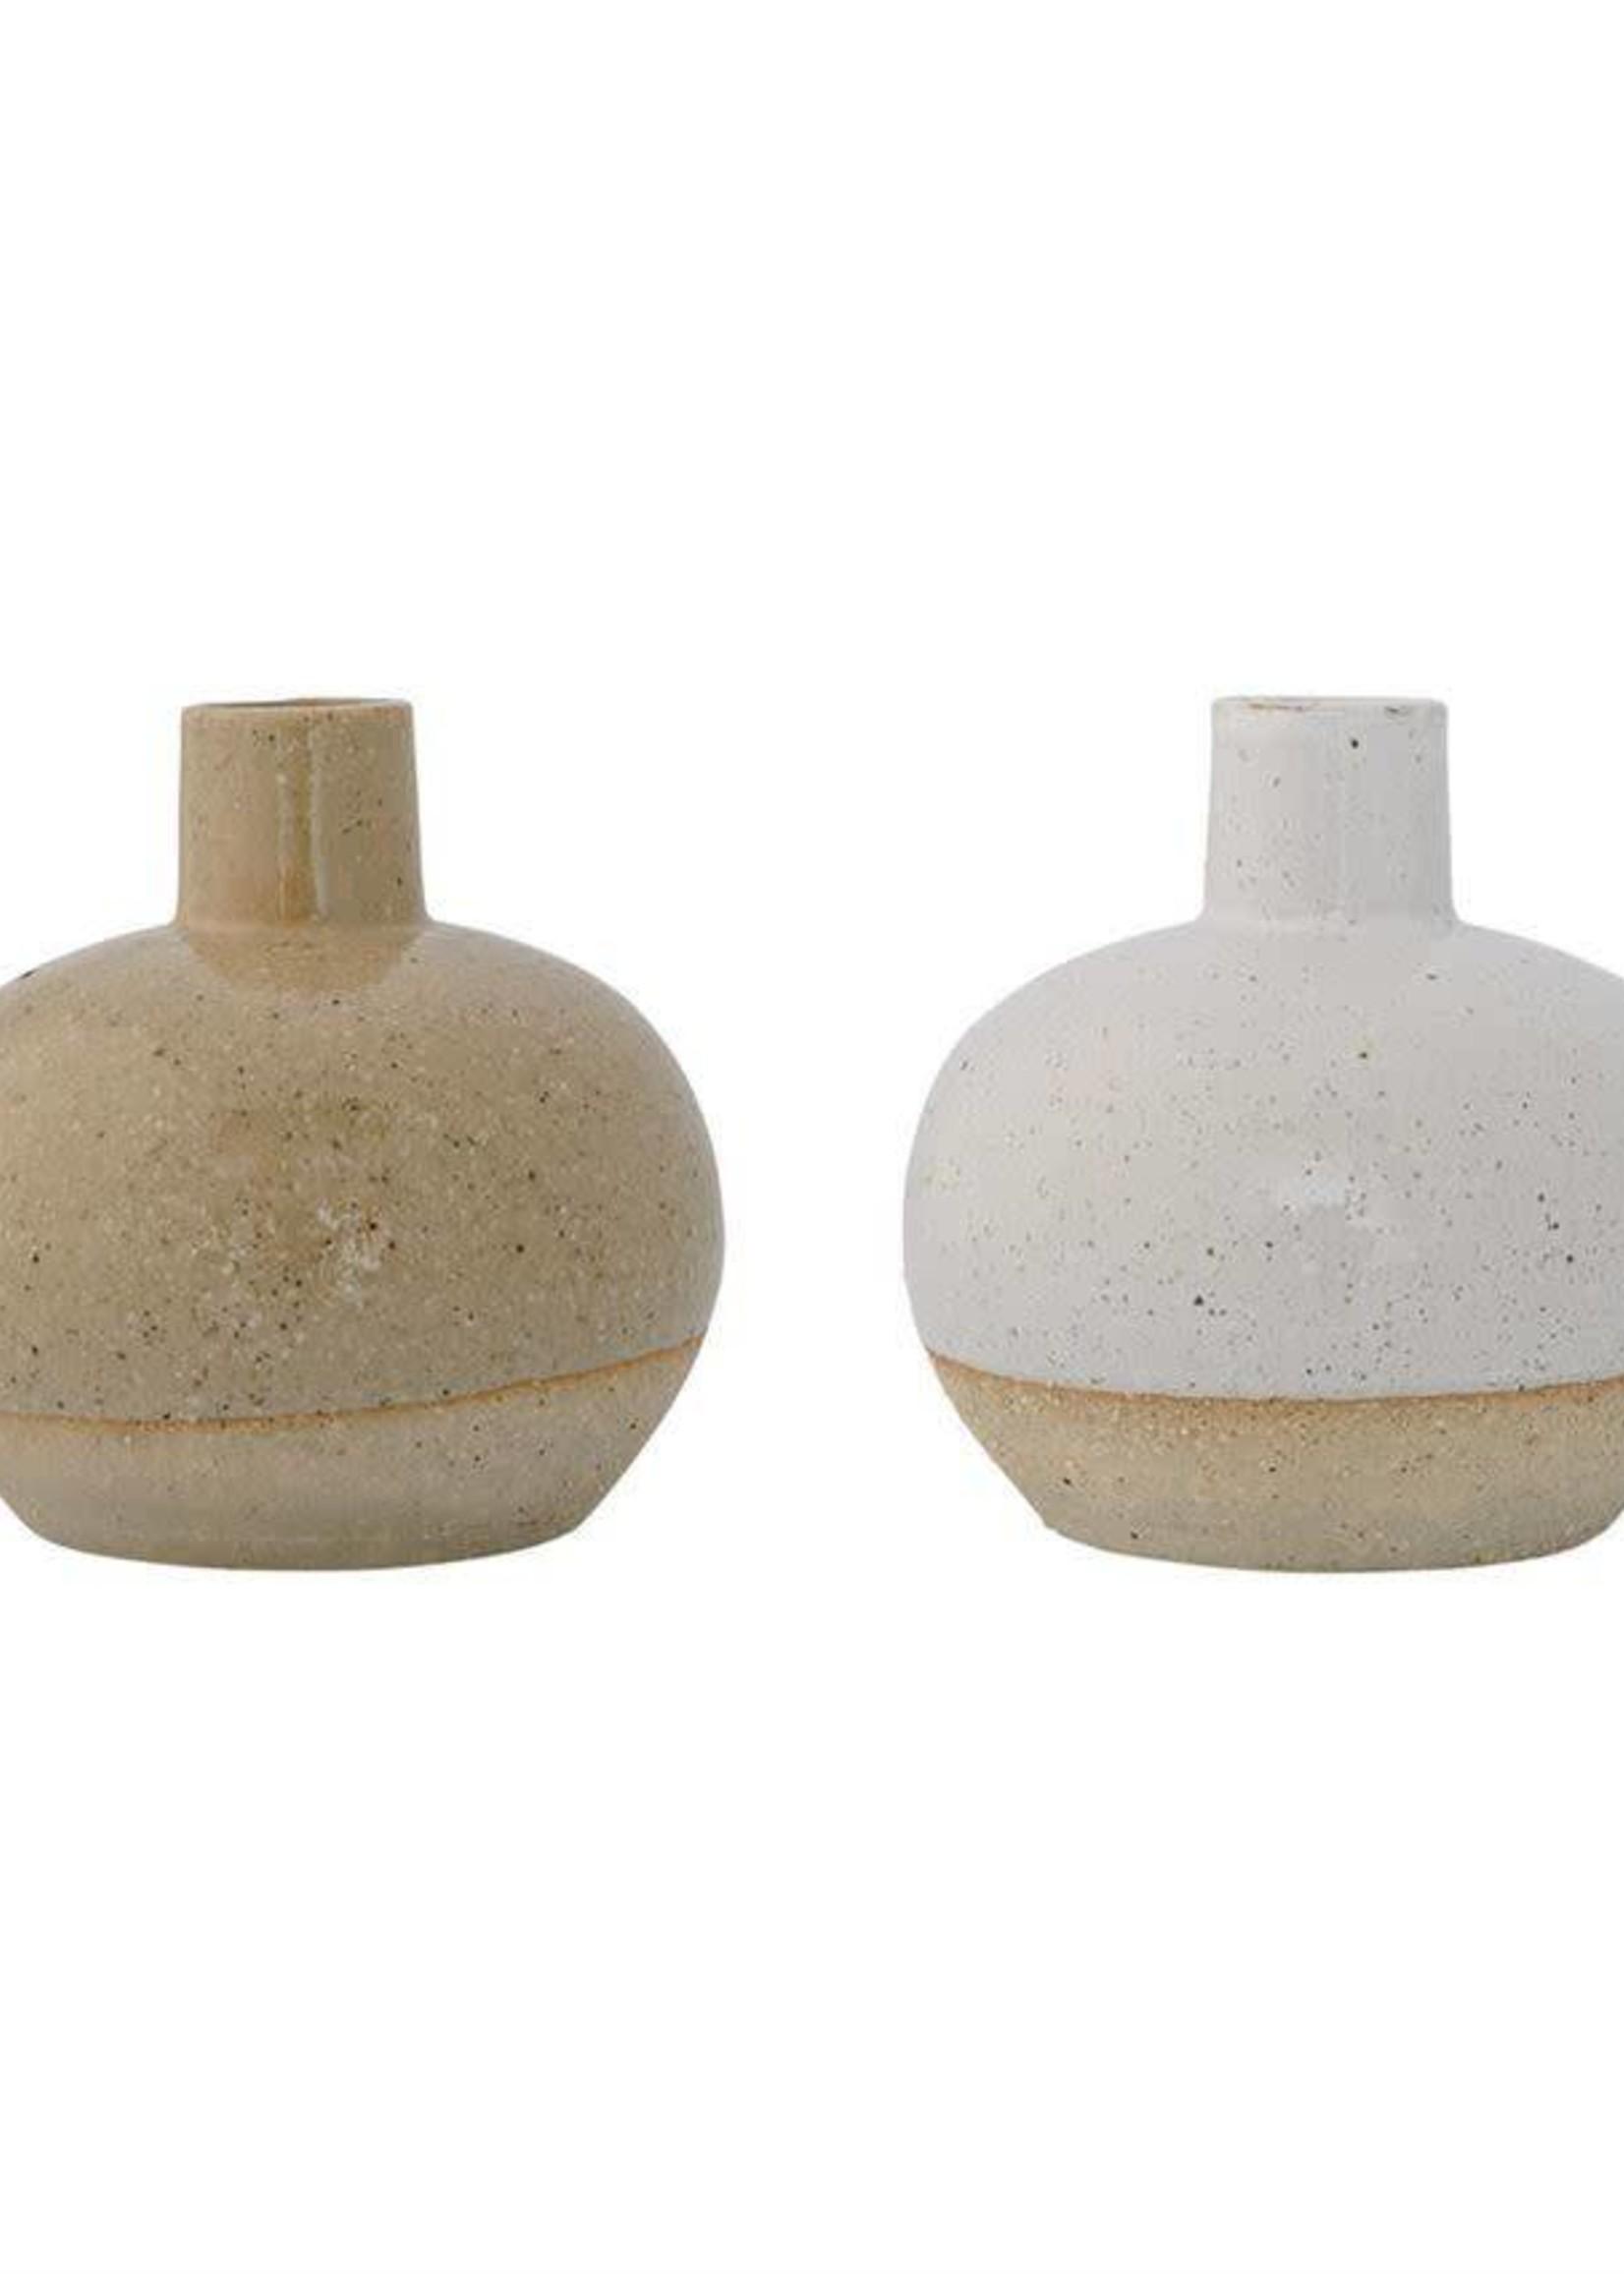 Vase w/ Sand Finish White